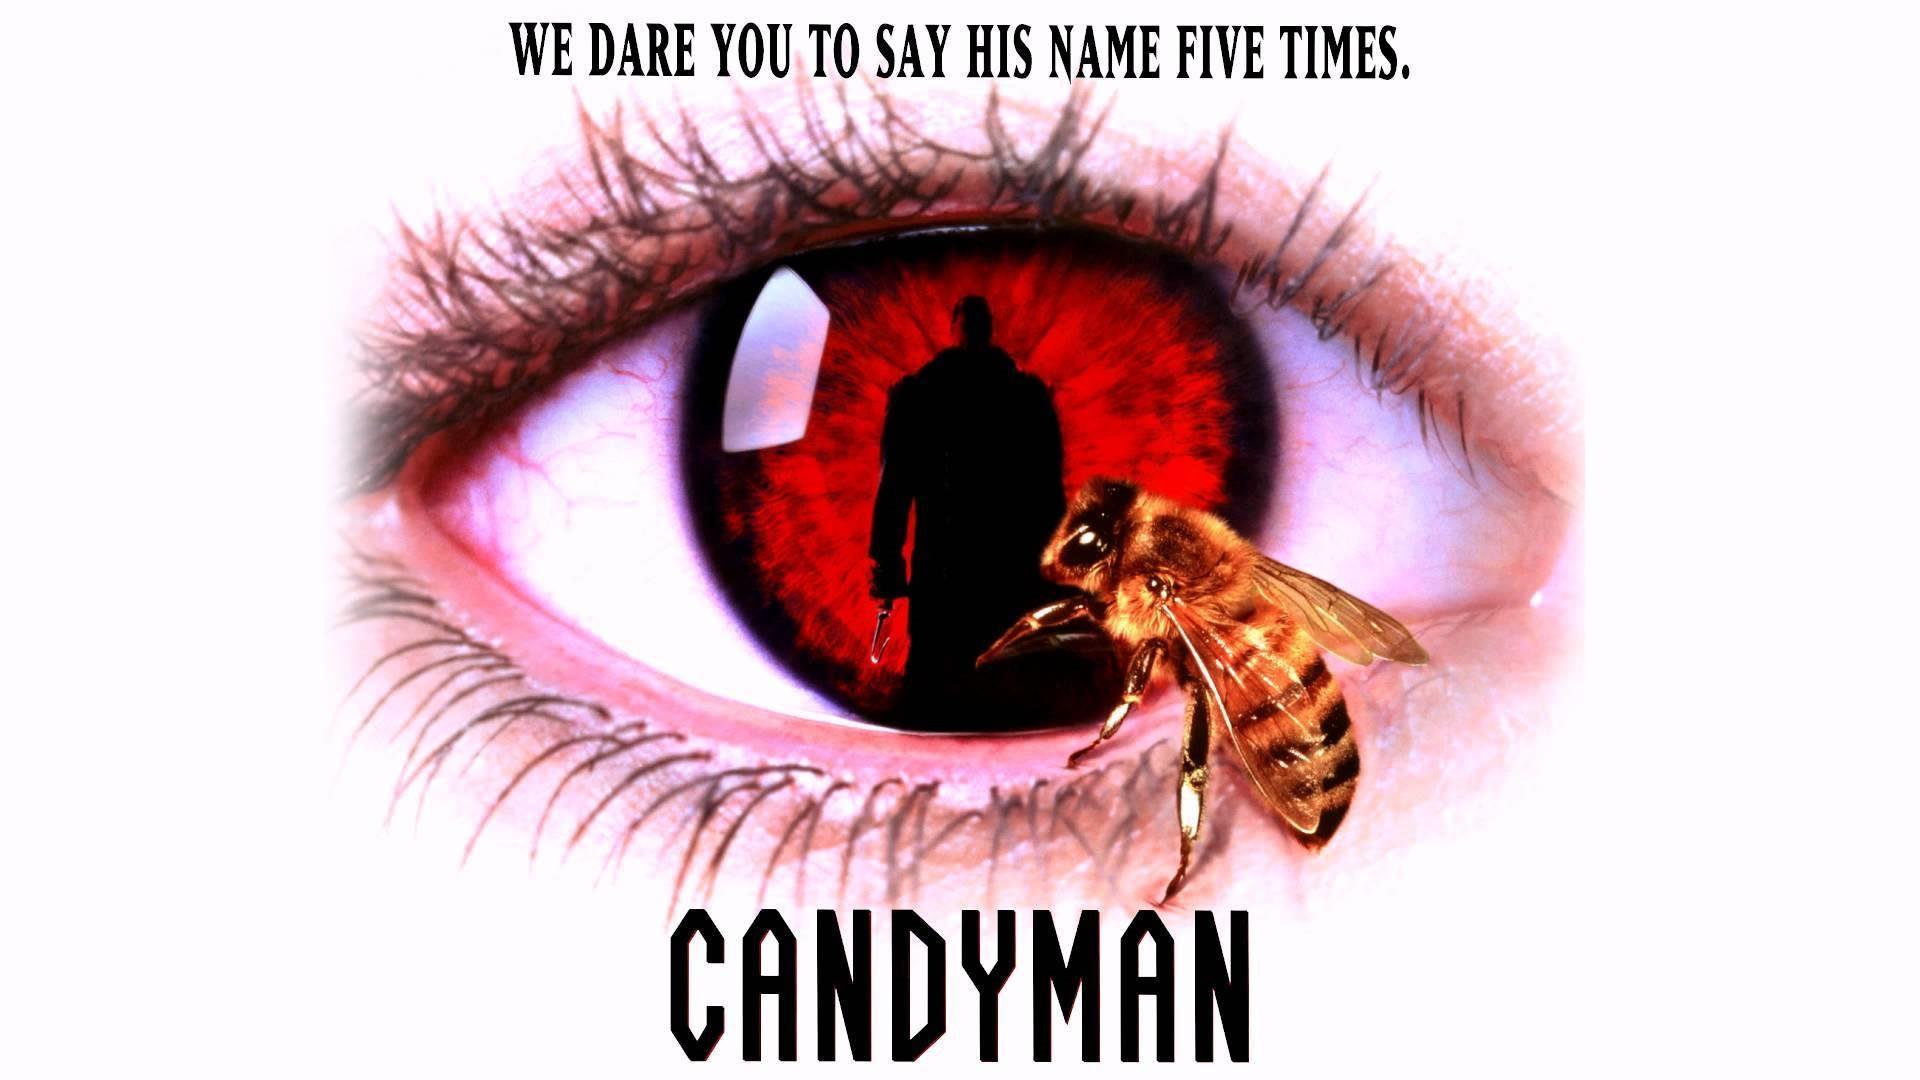 Candyman film series